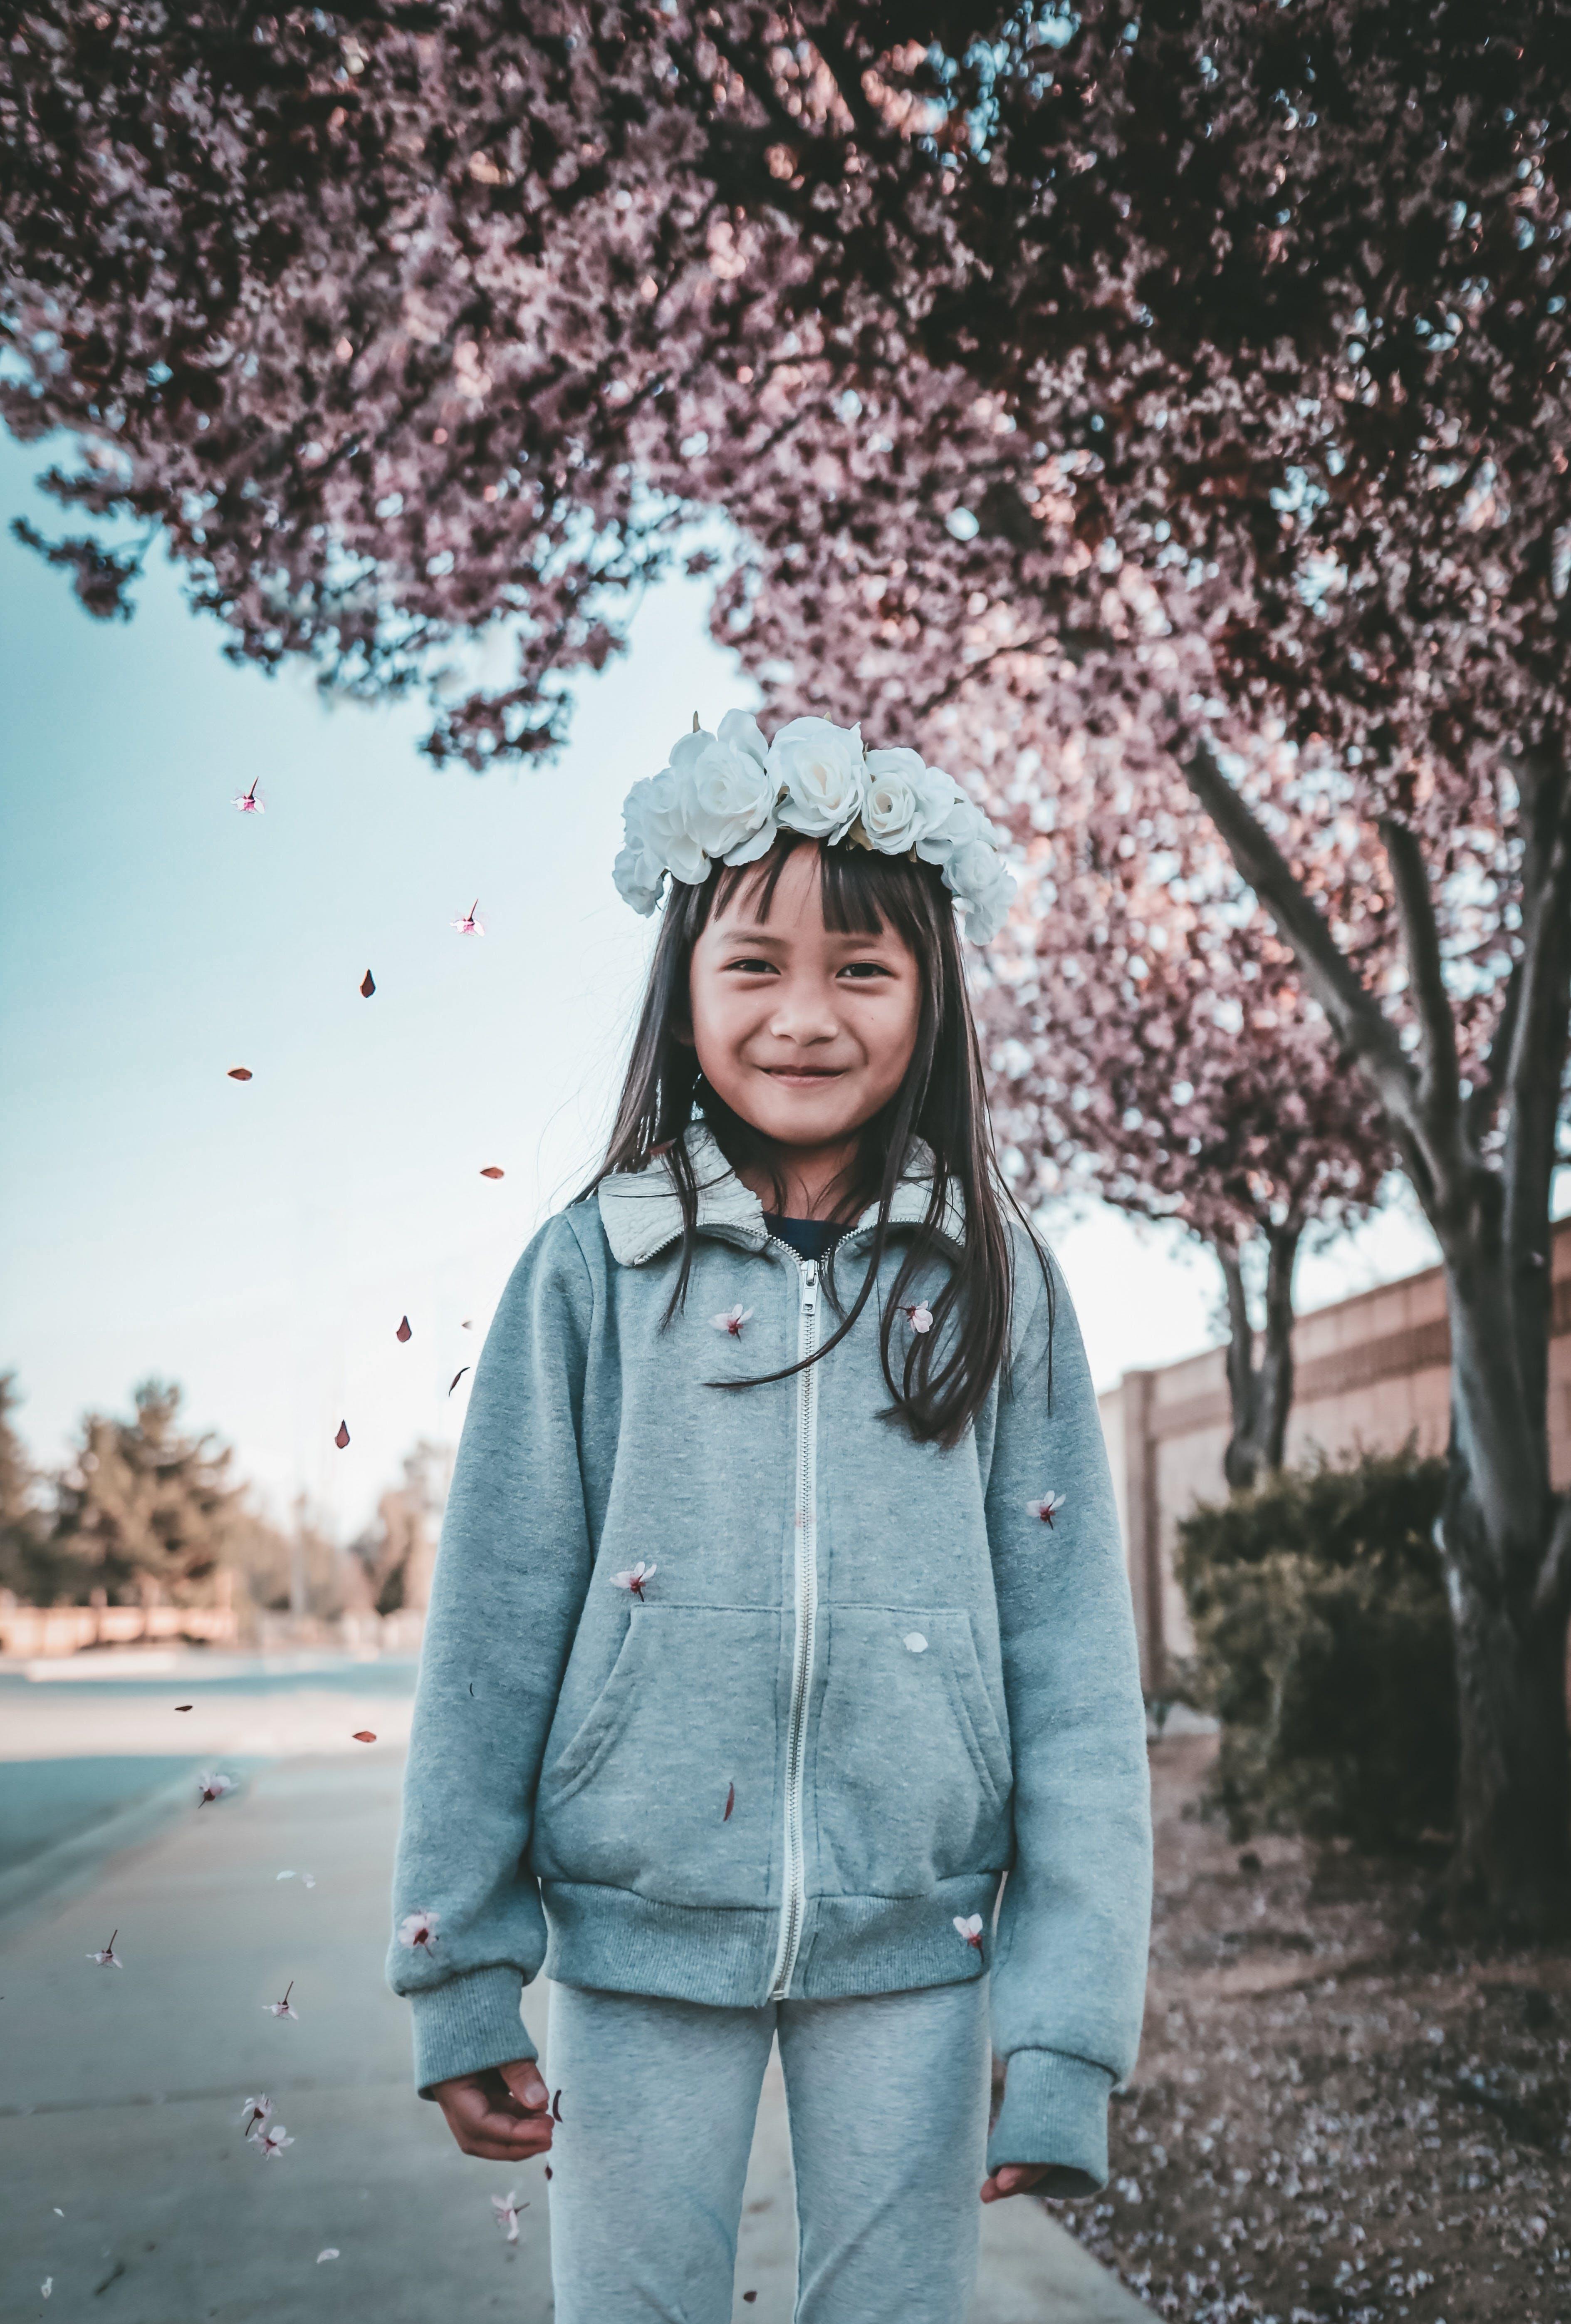 Girl Wearing Gray Zip-up Hoodie and Pants With Flower Tiara